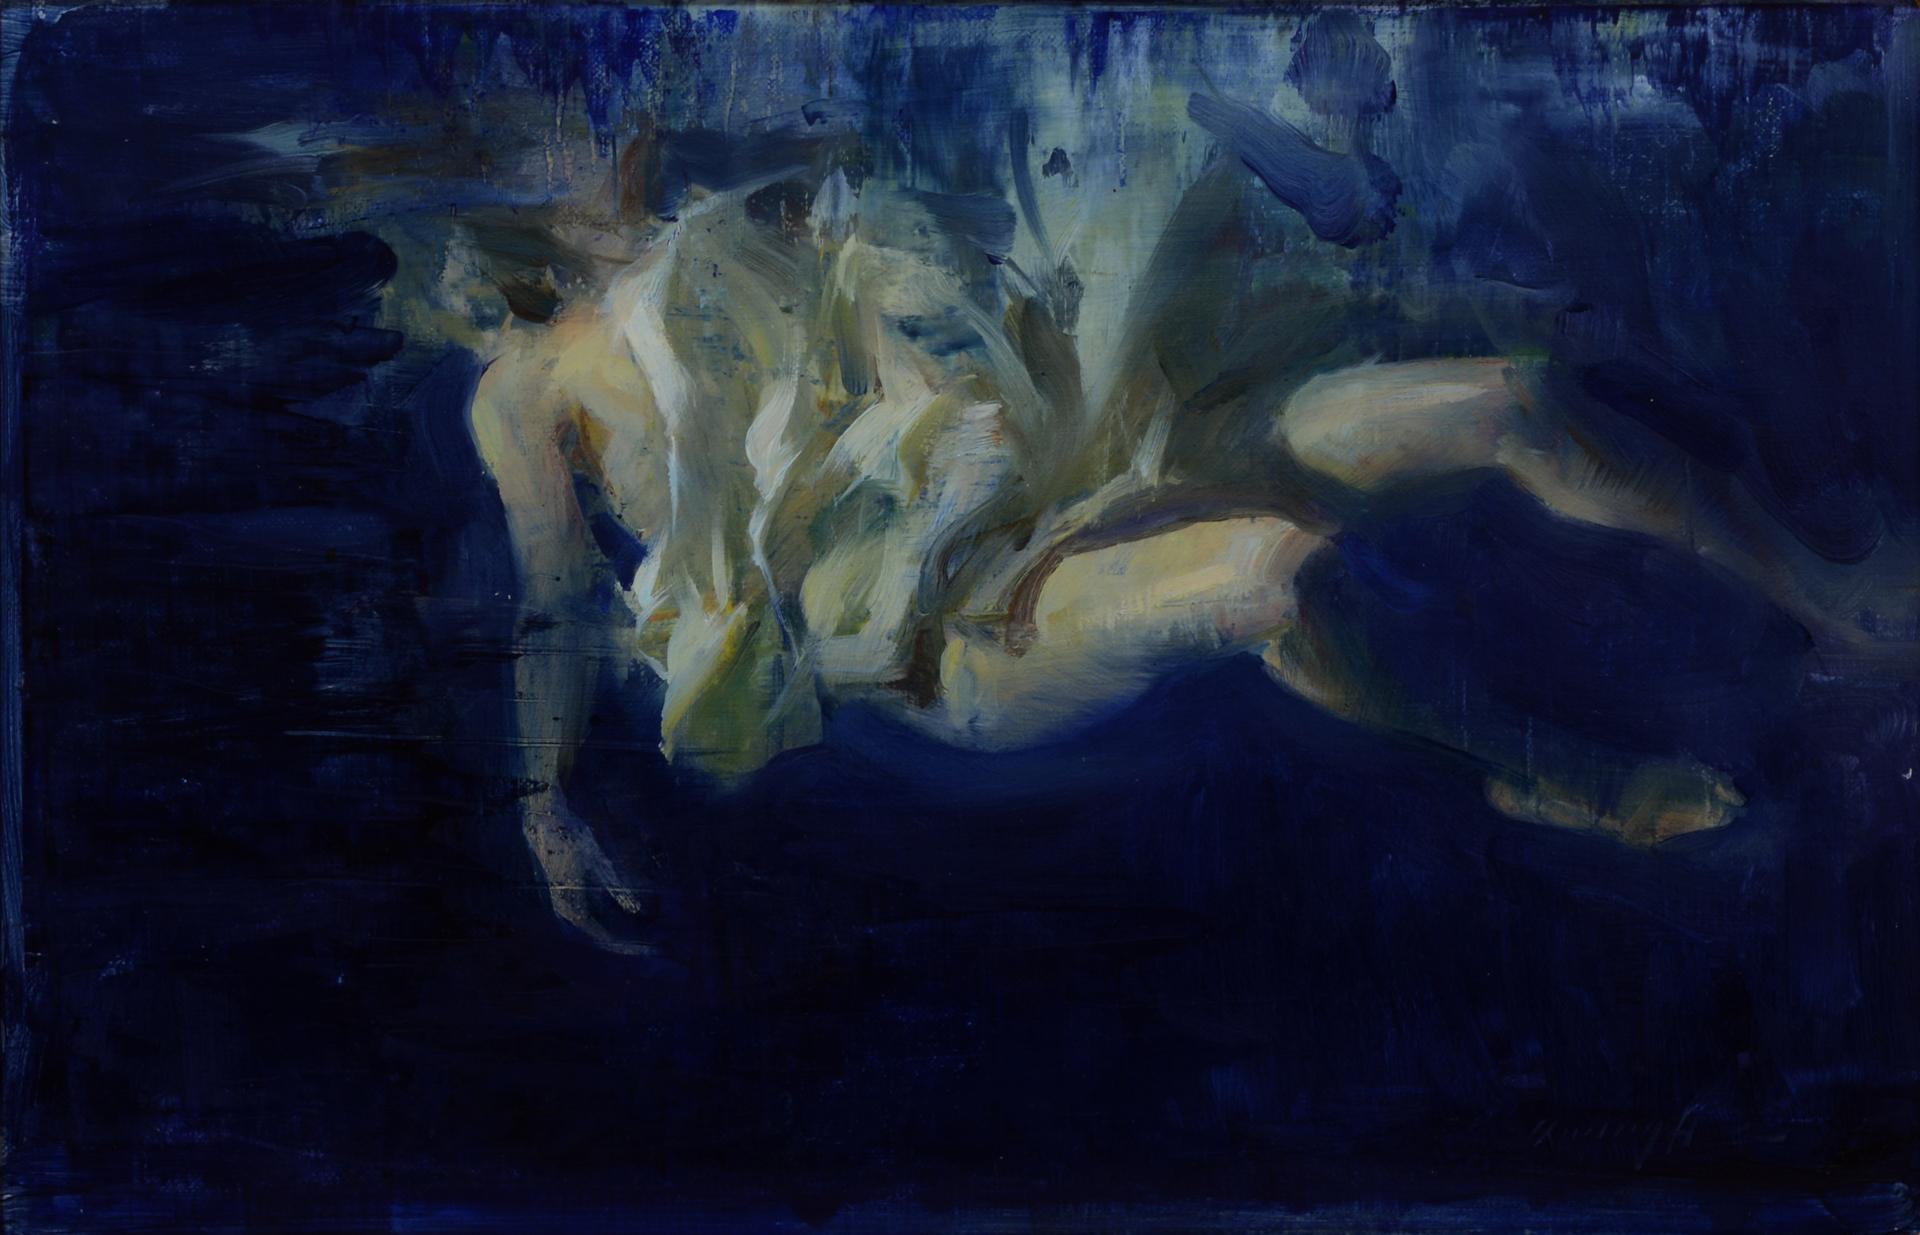 Deep Blue by Quang Ho